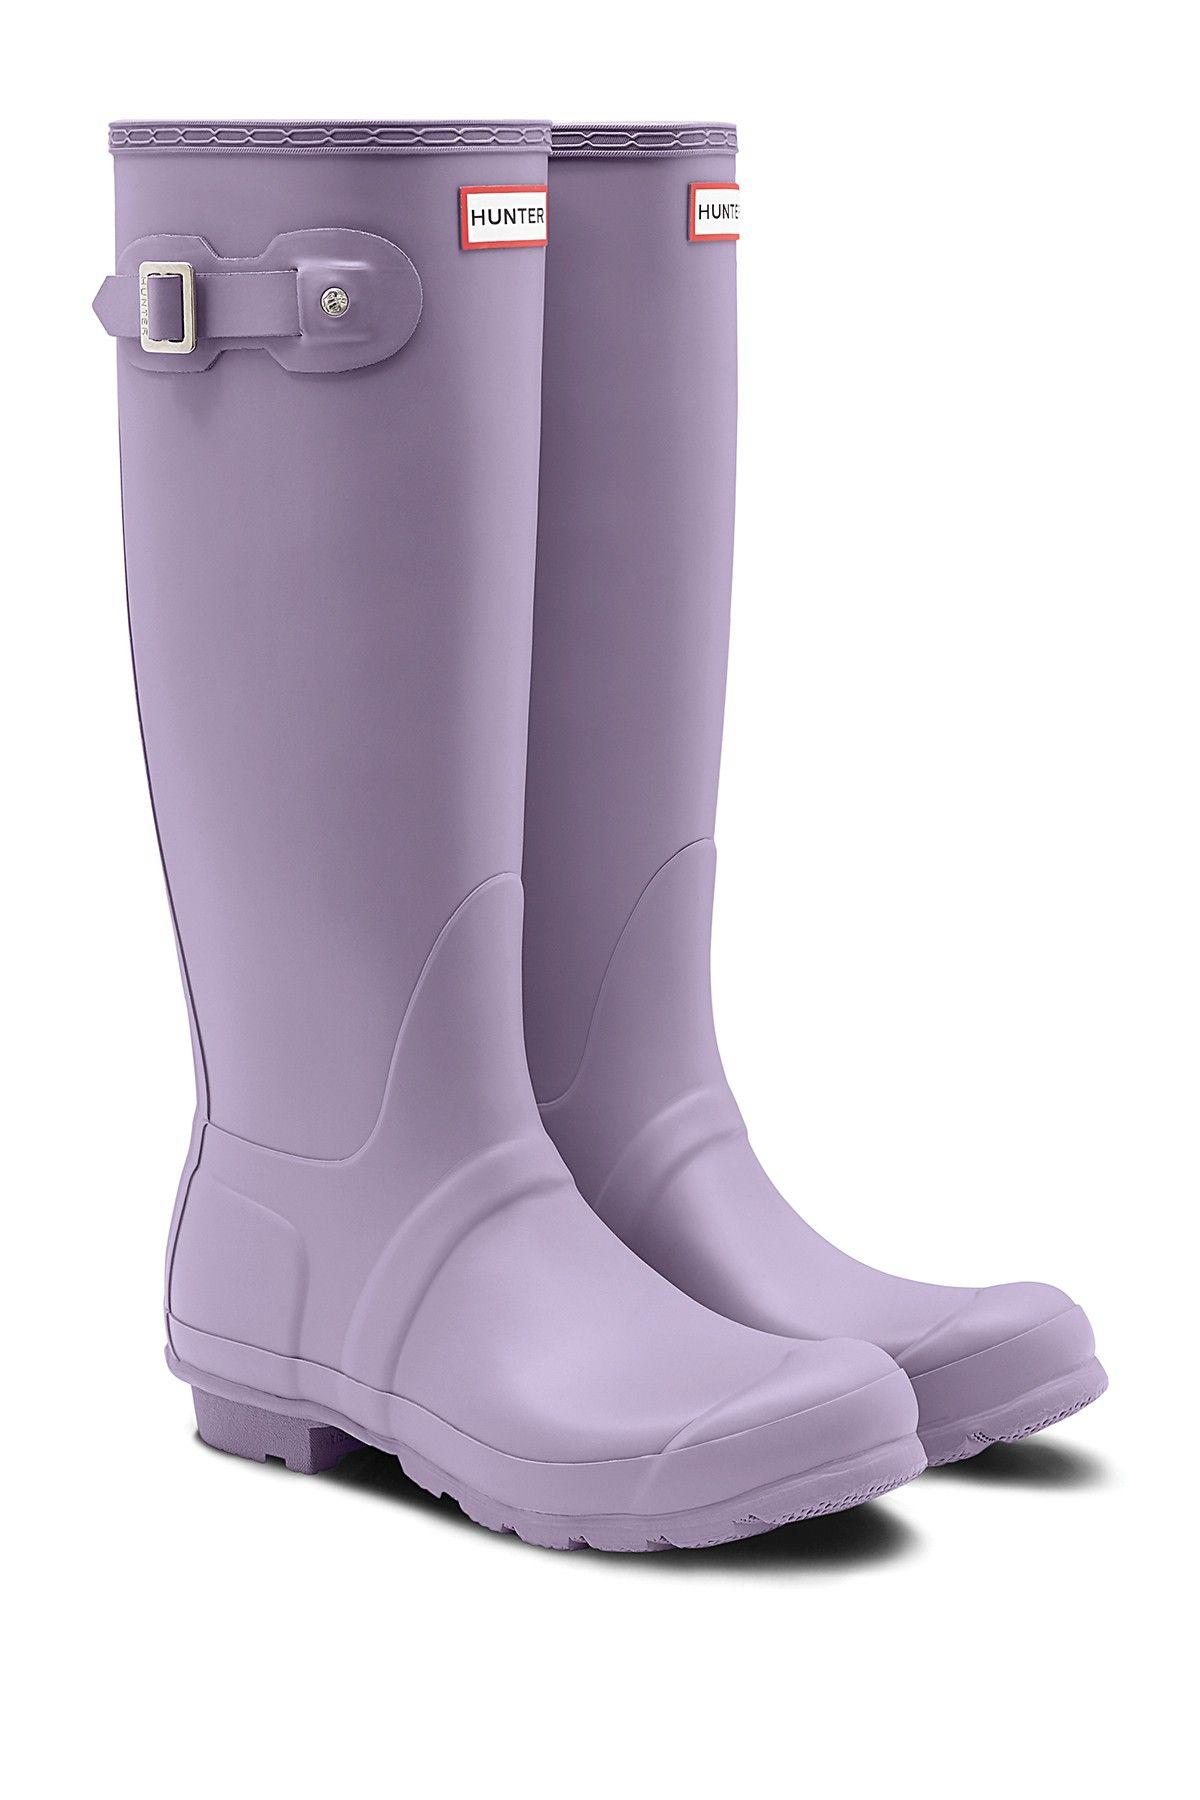 Hunter Original Tall Waterproof Rain Boot Hunter Boots Outfit